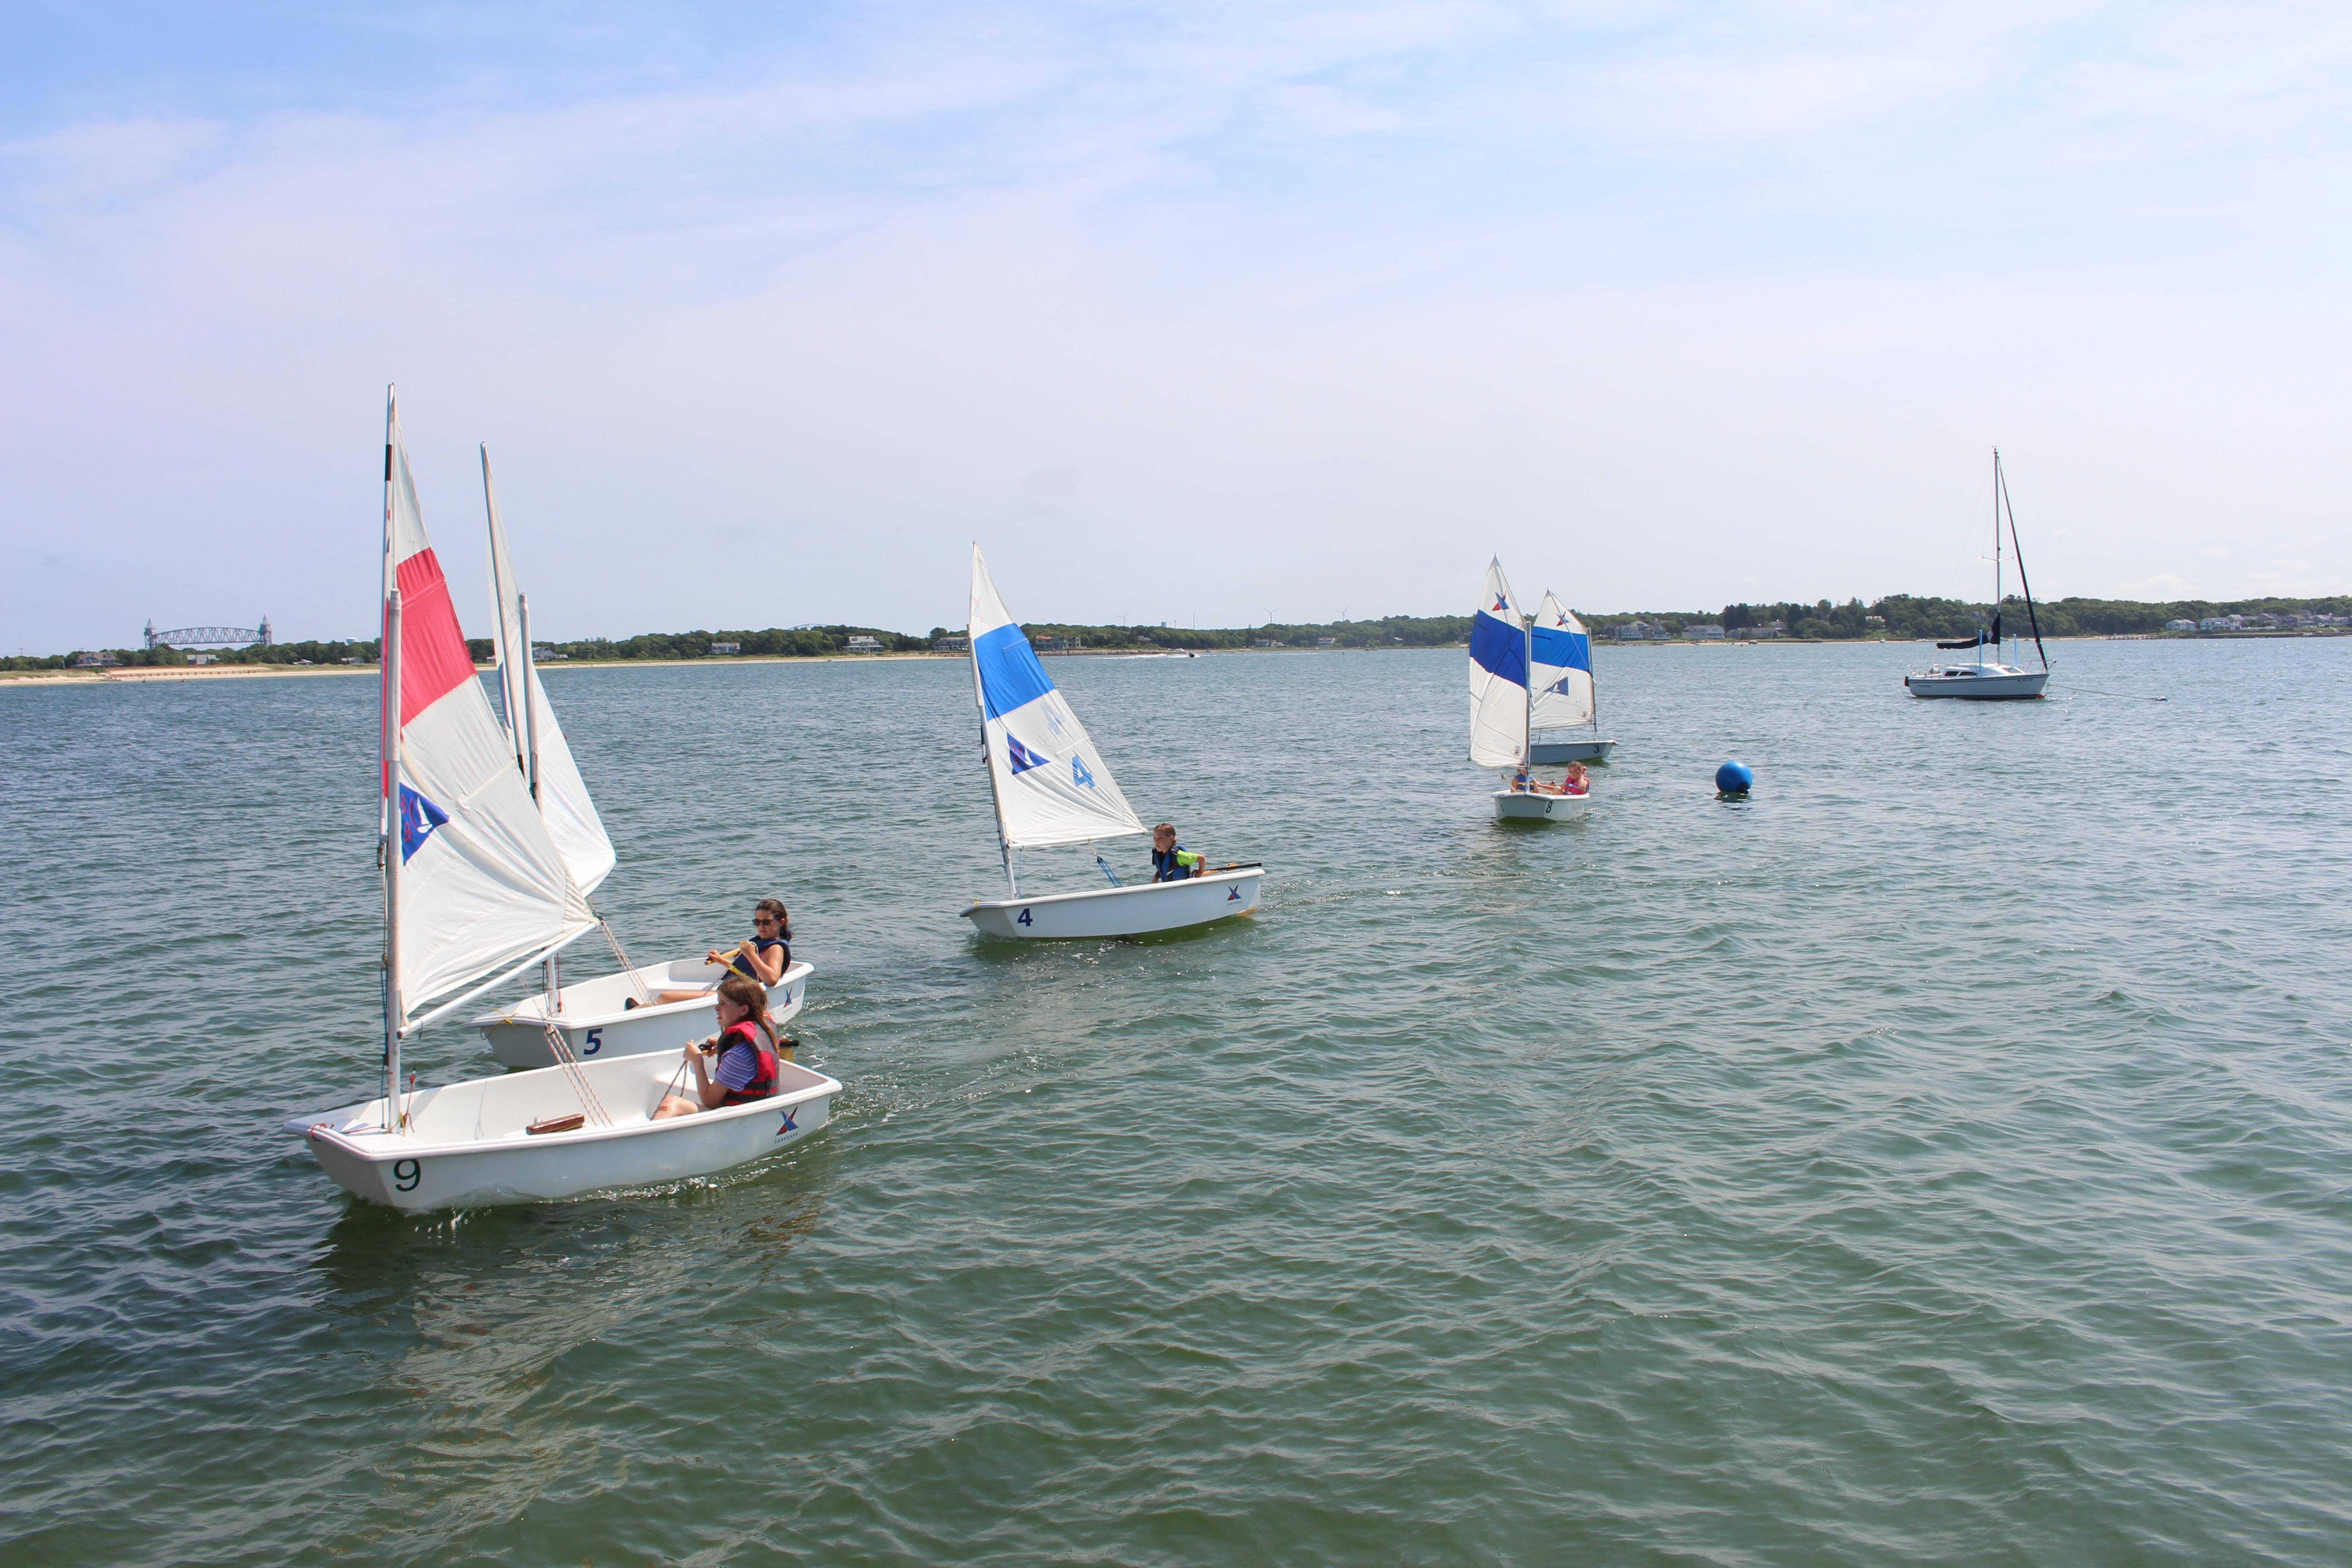 Prams sailing